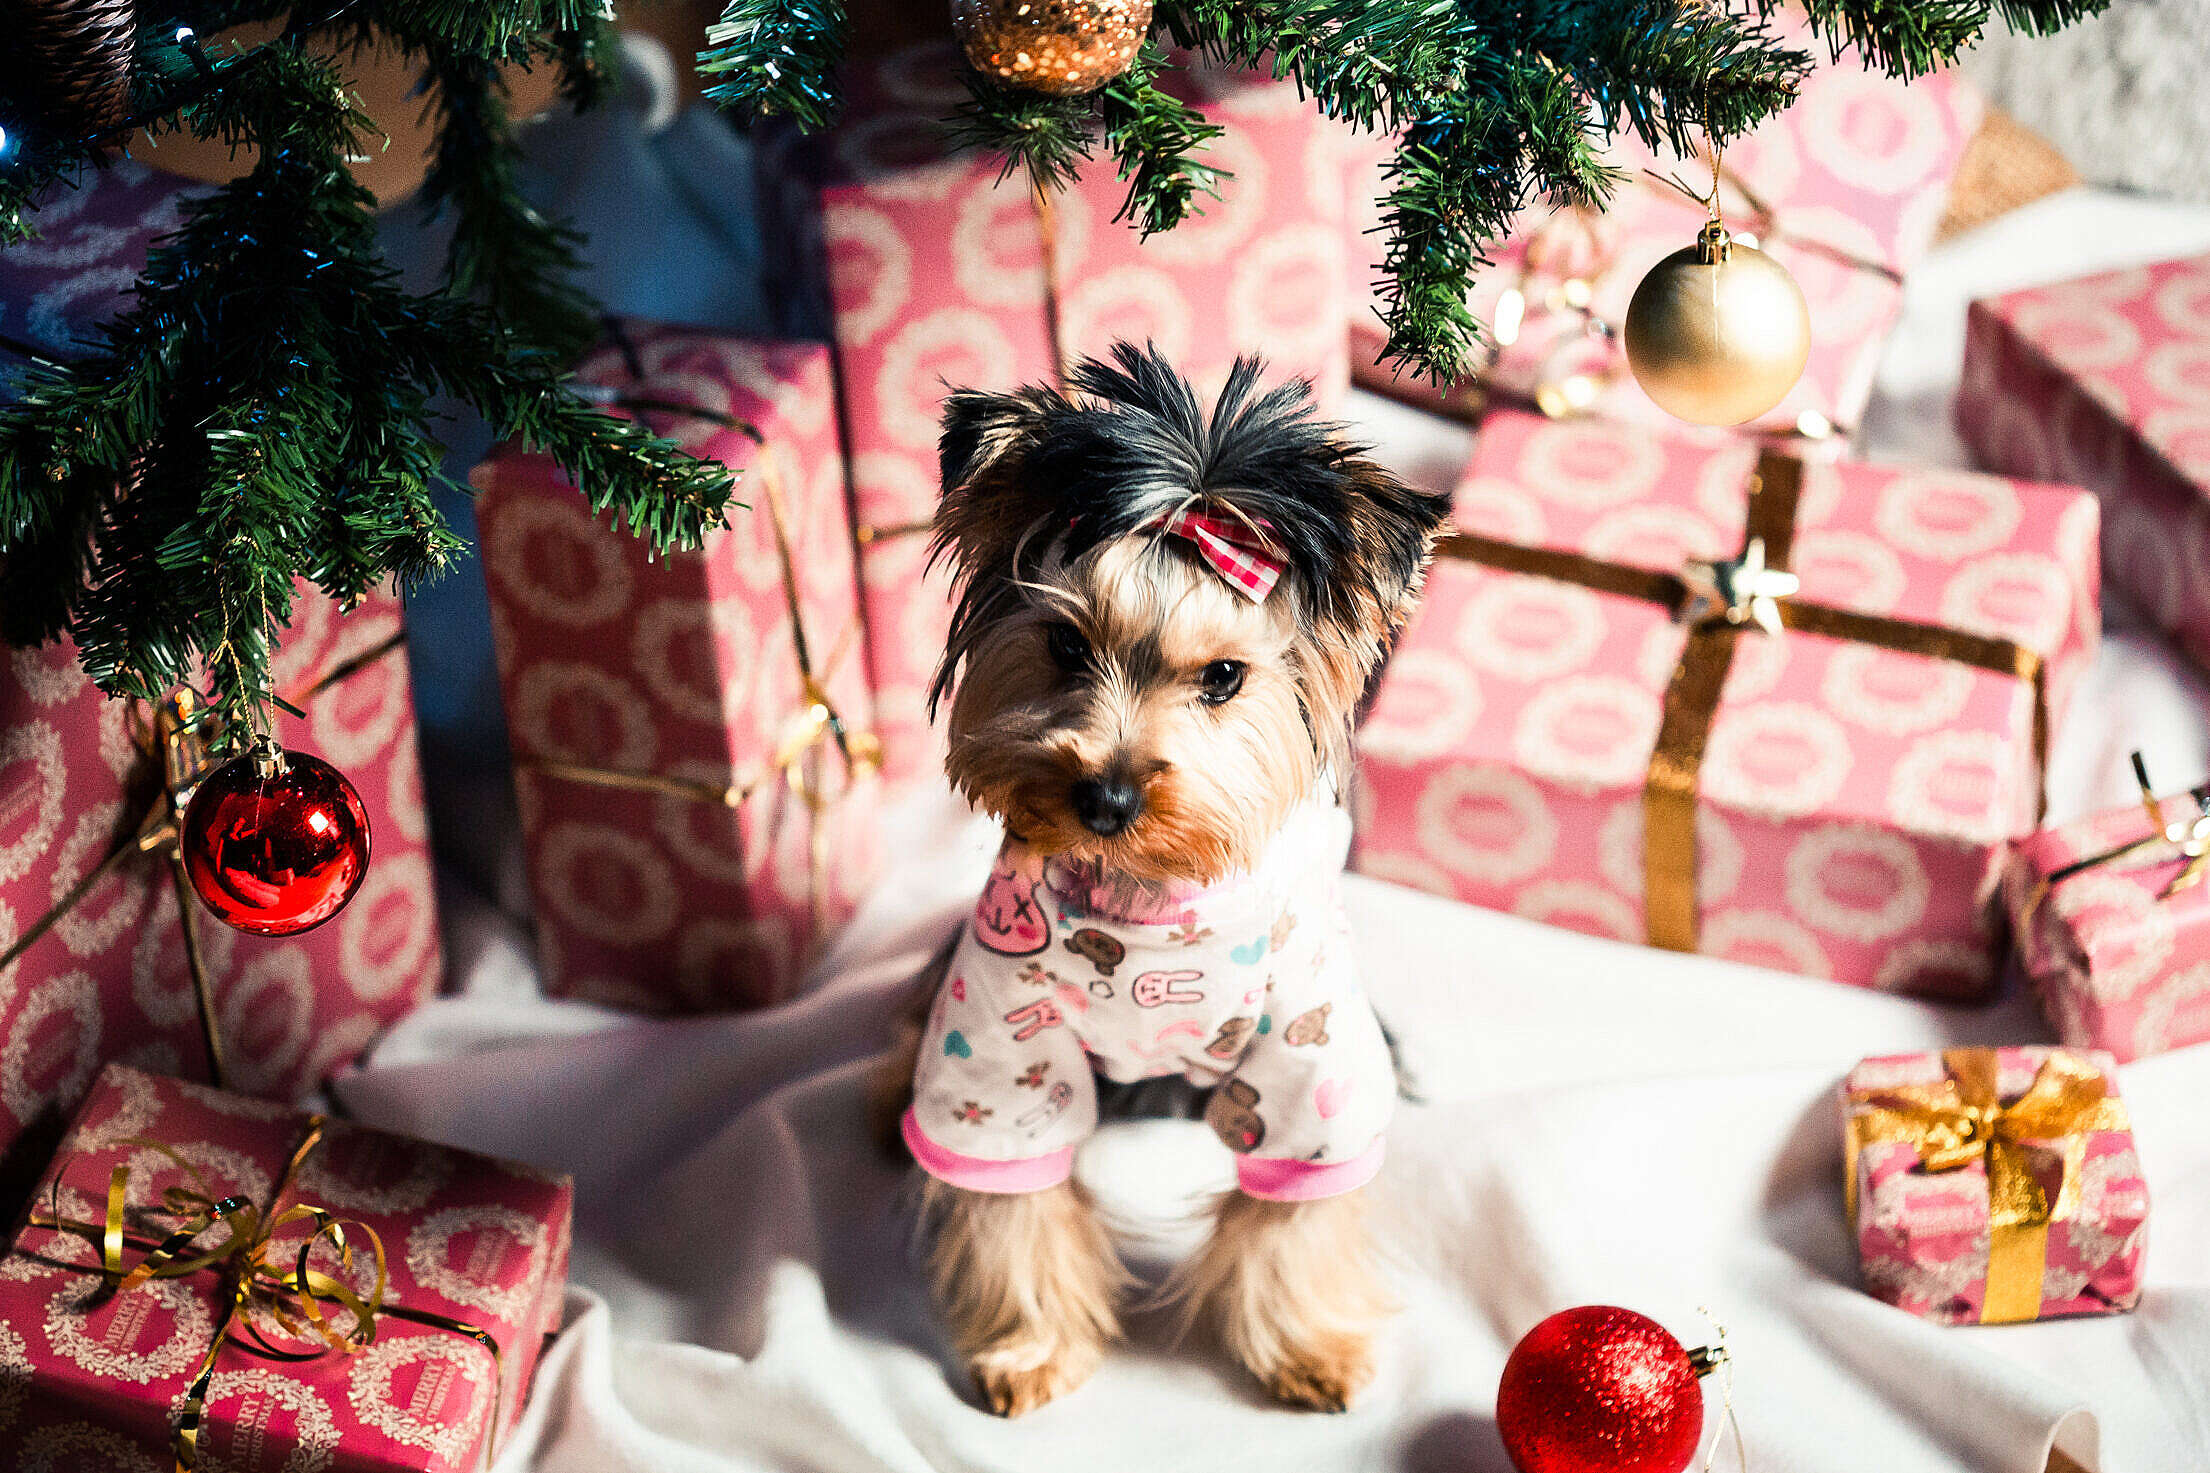 Cute Puppy in Pyjamas Under Christmas Tree Free Stock Photo